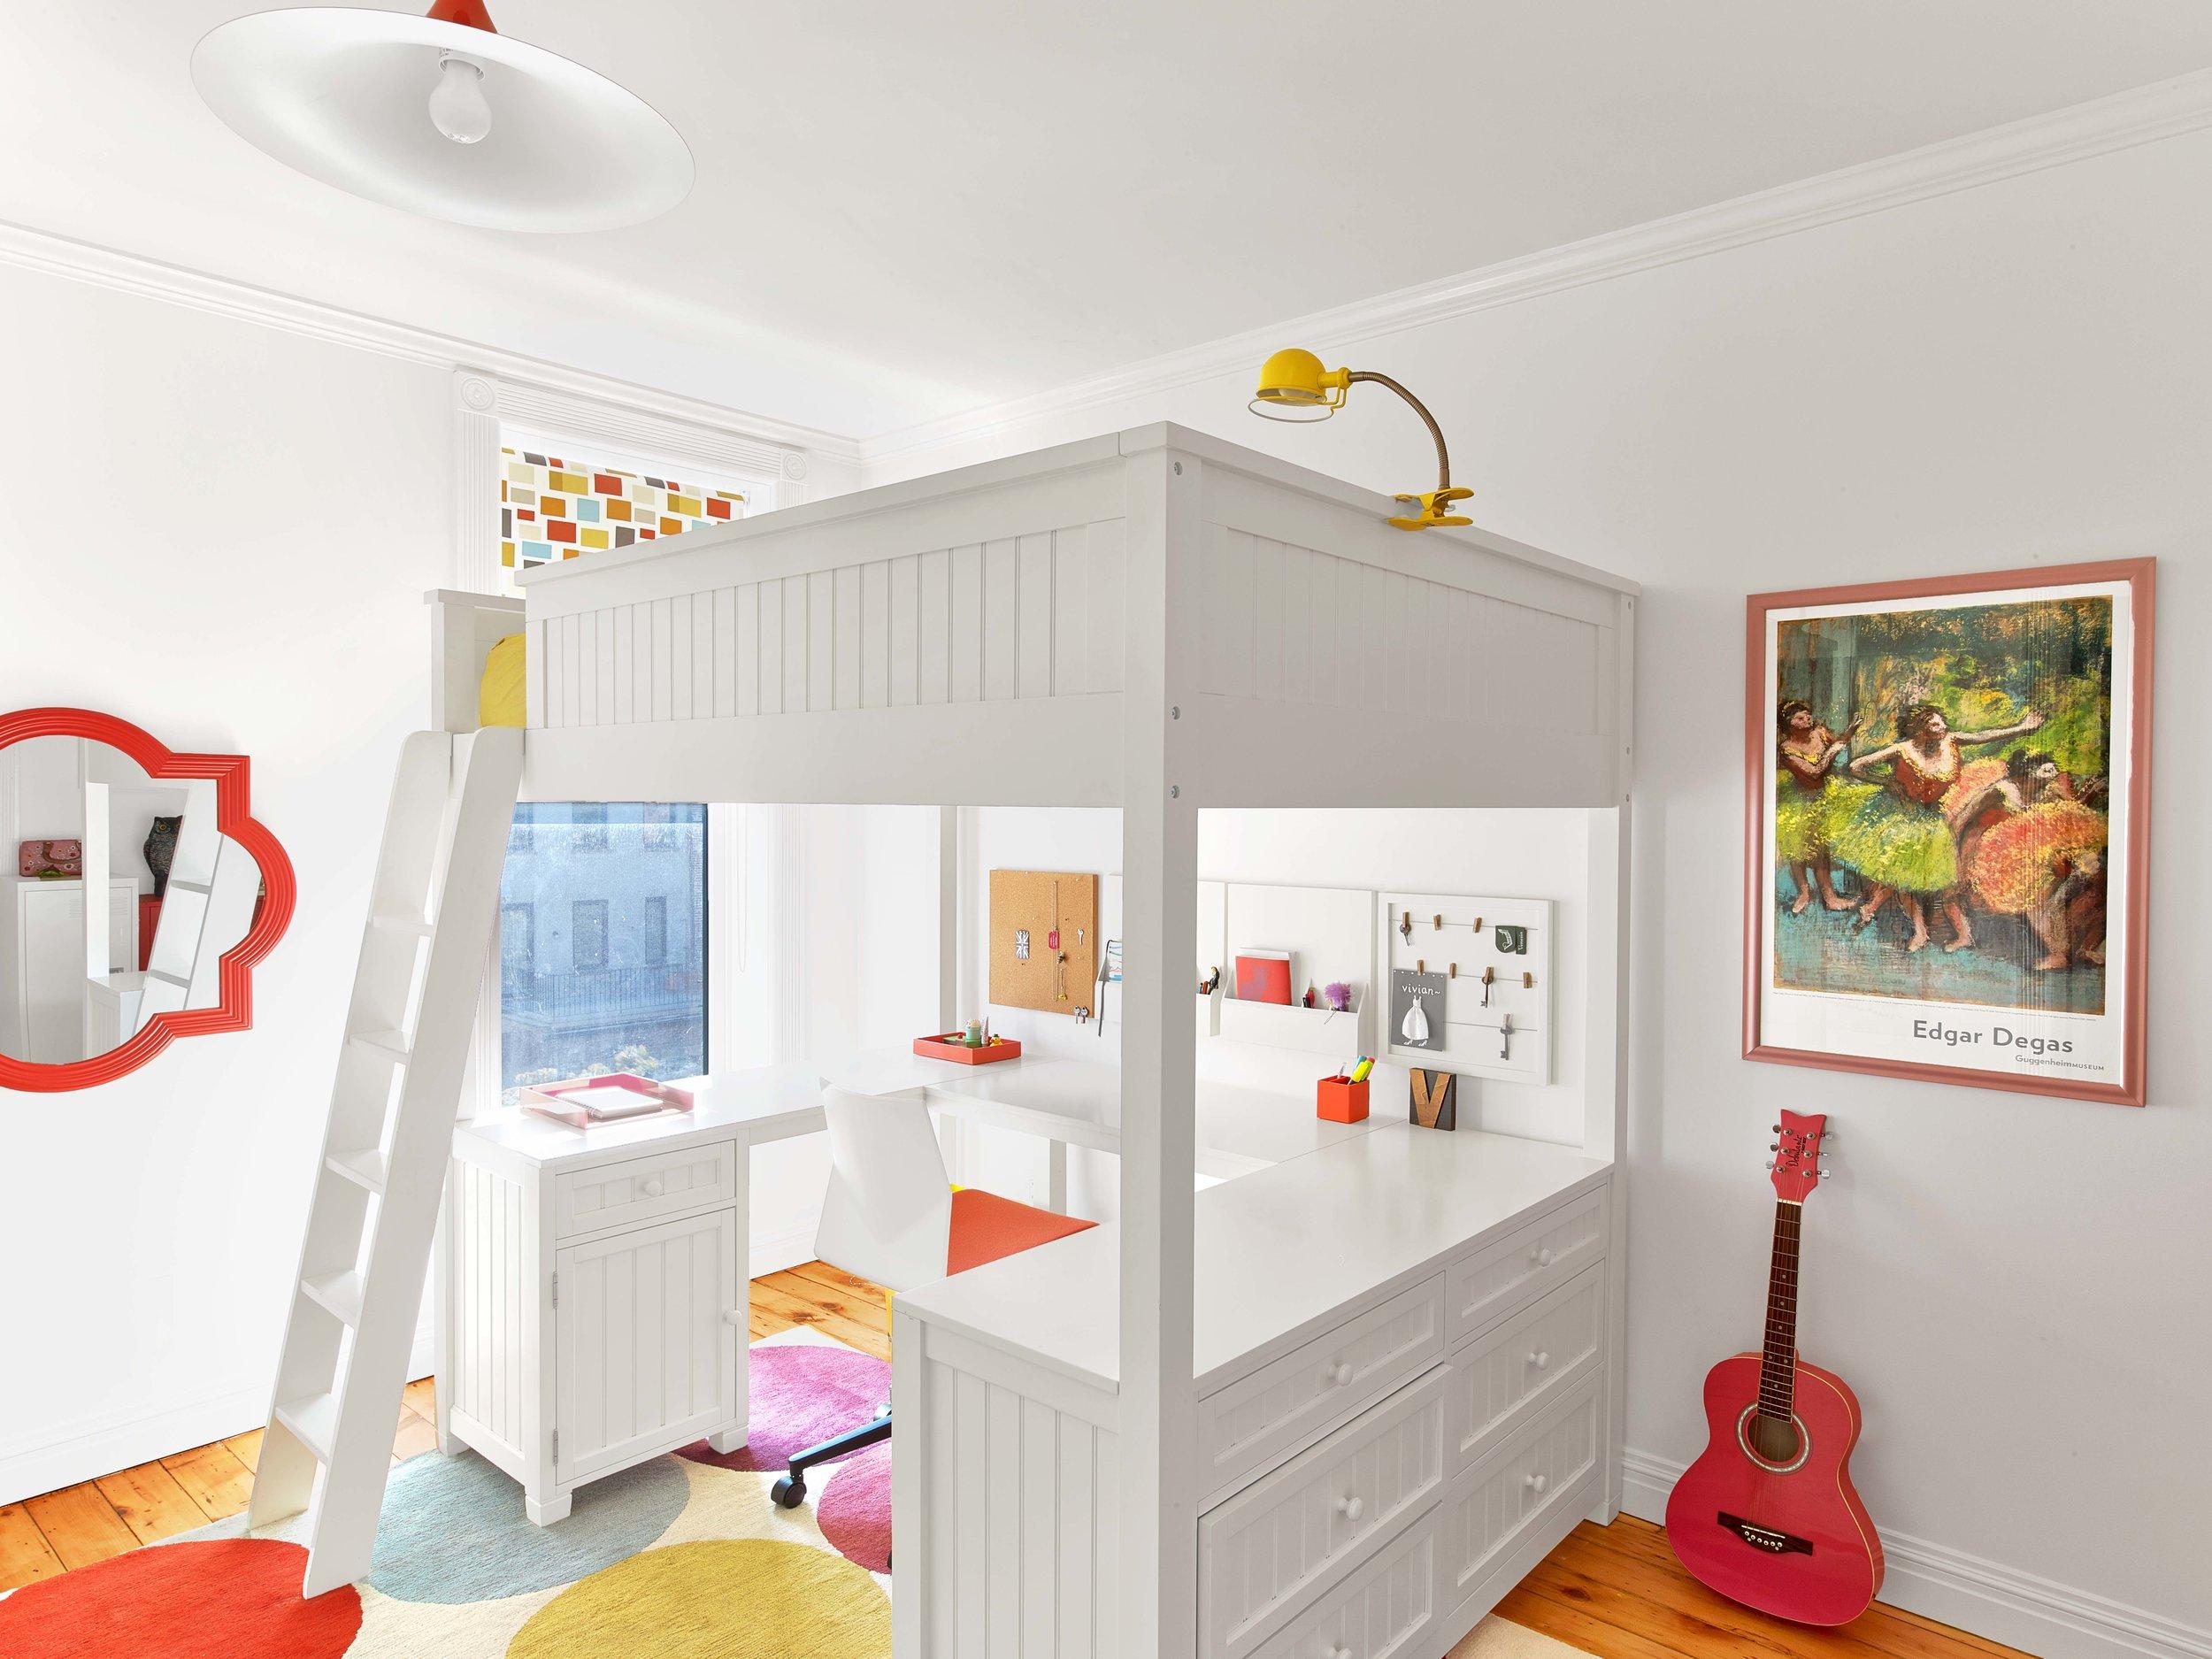 Fun-Bright-Kids-Room-Pottery-Barn-White-Bunk-Bed-JMorris-Design-Brooklyn.jpg